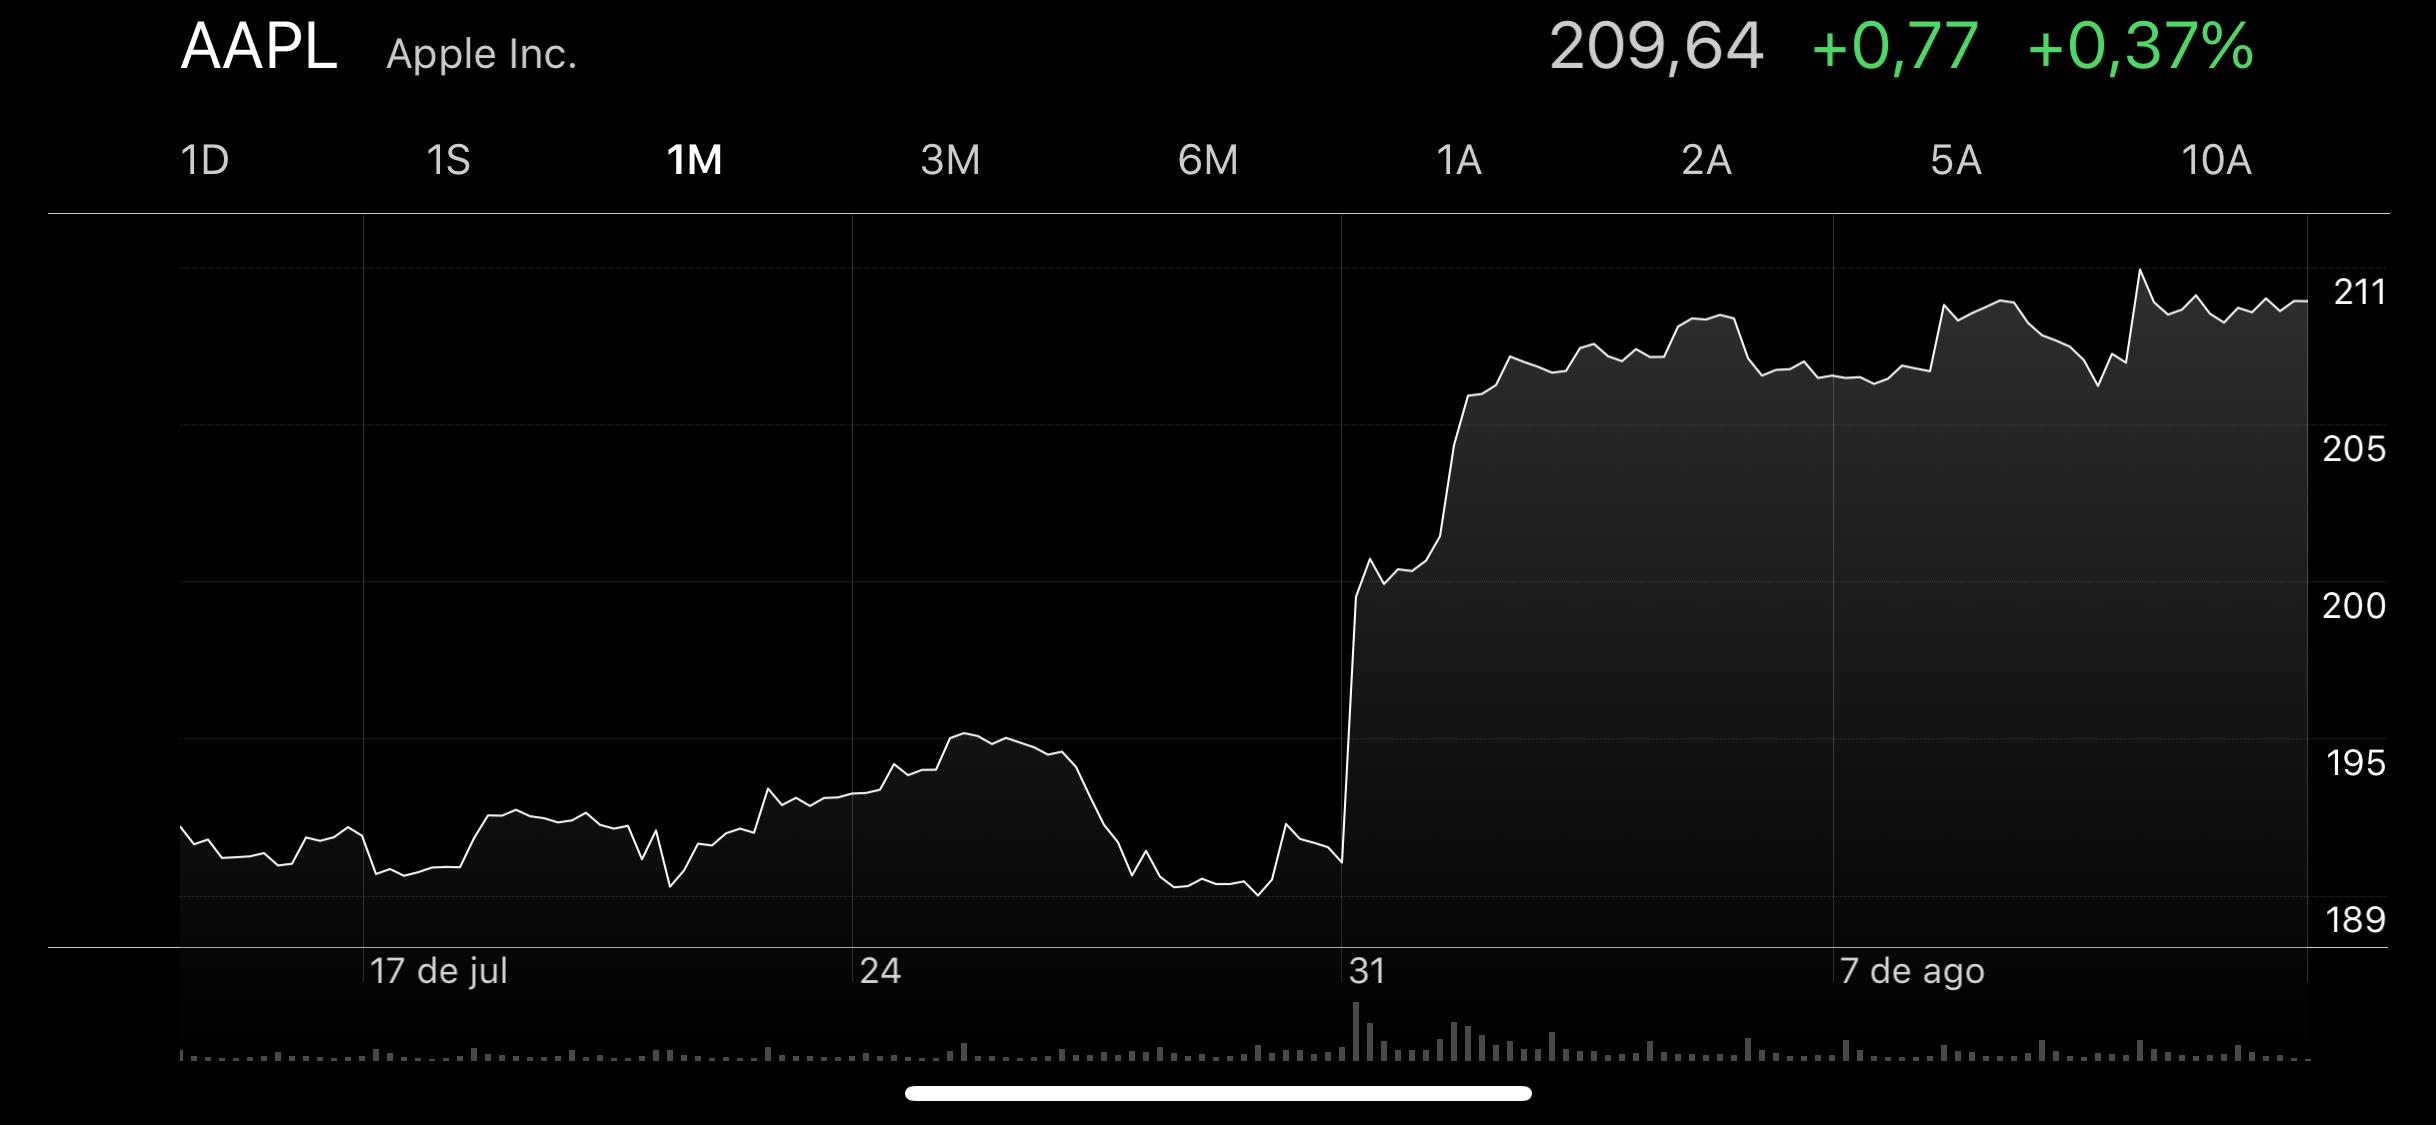 AAPL - 14 de agosto de 2018